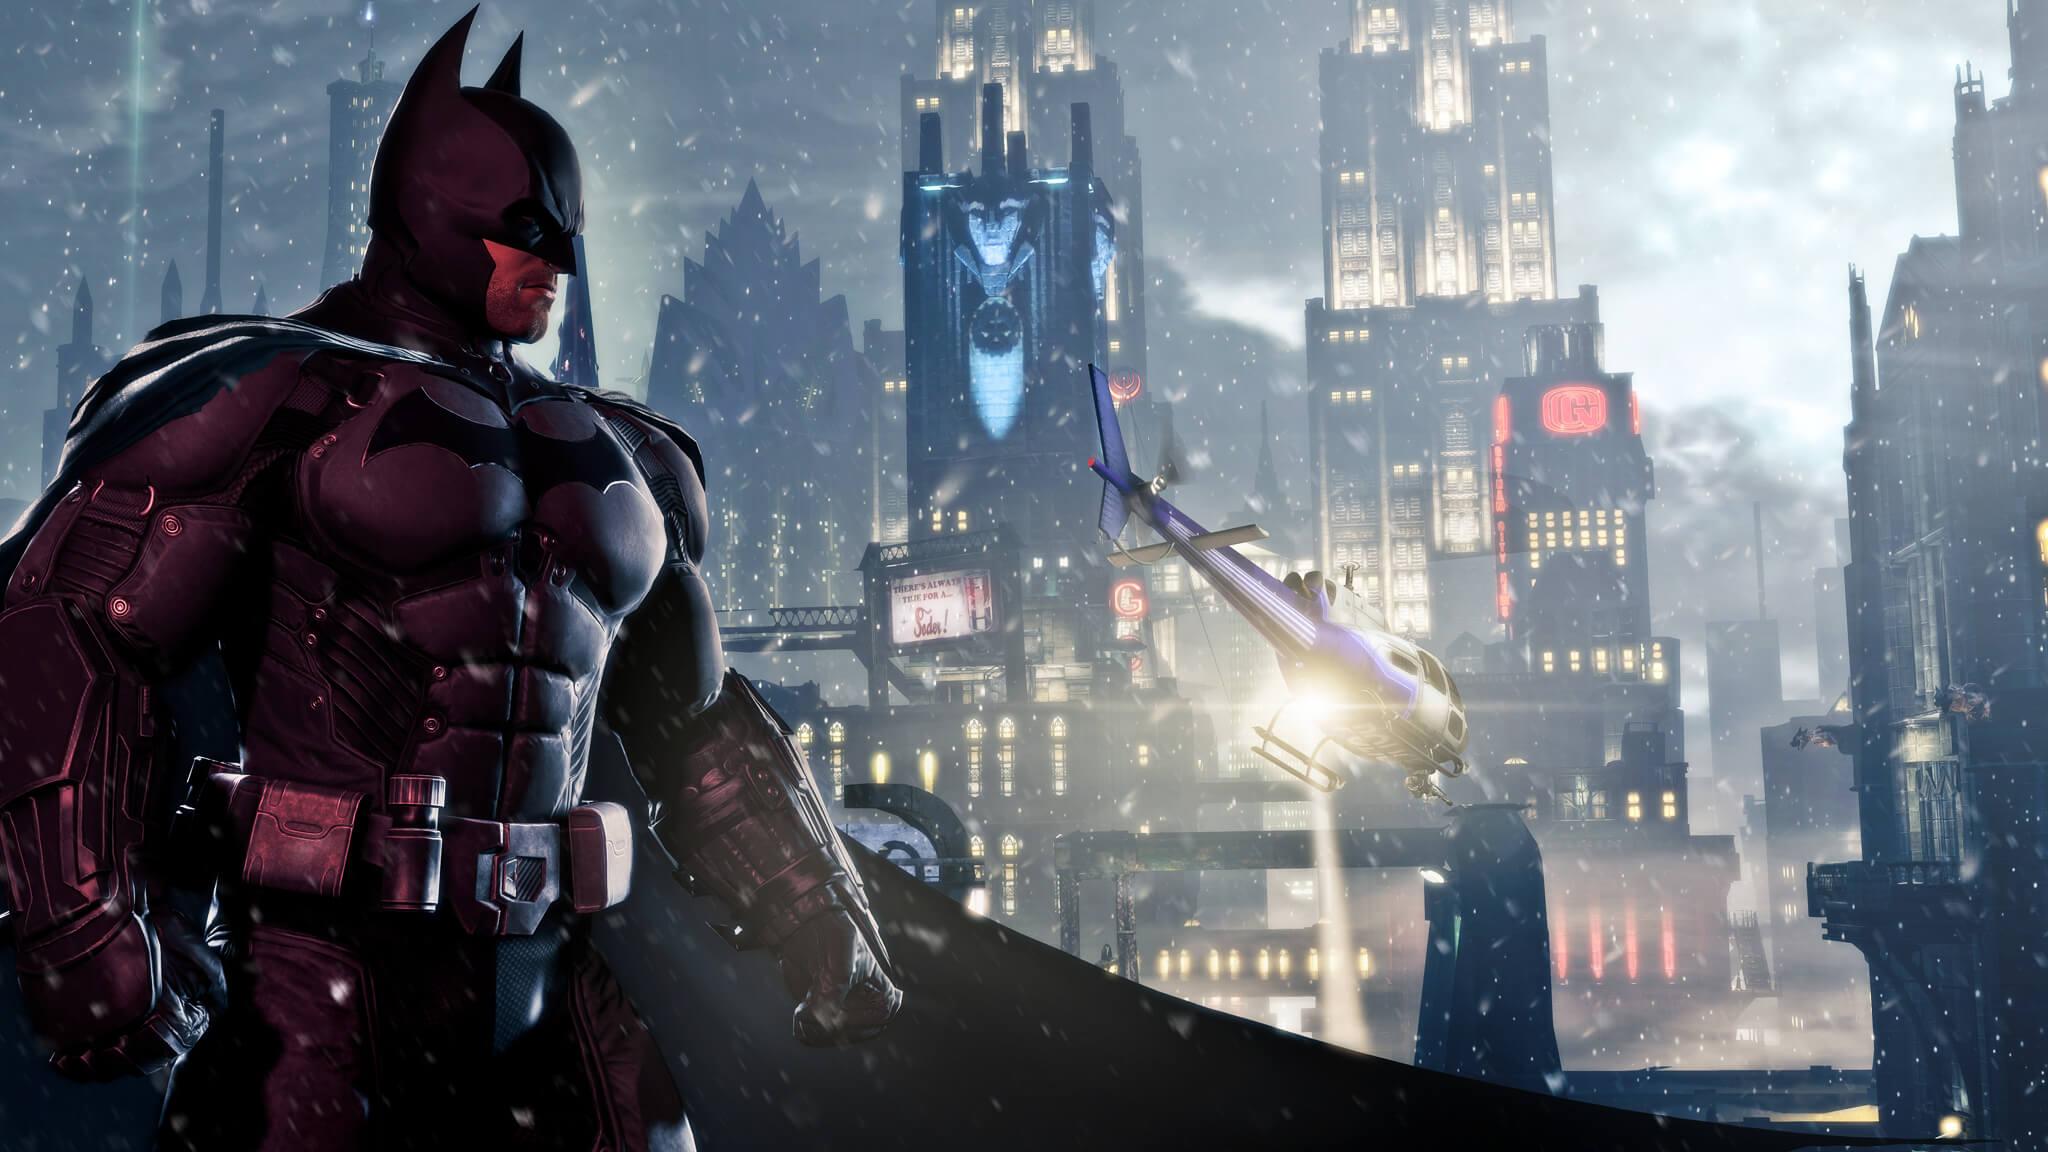 'Batman: Arkham Origins' Hands-On Preview